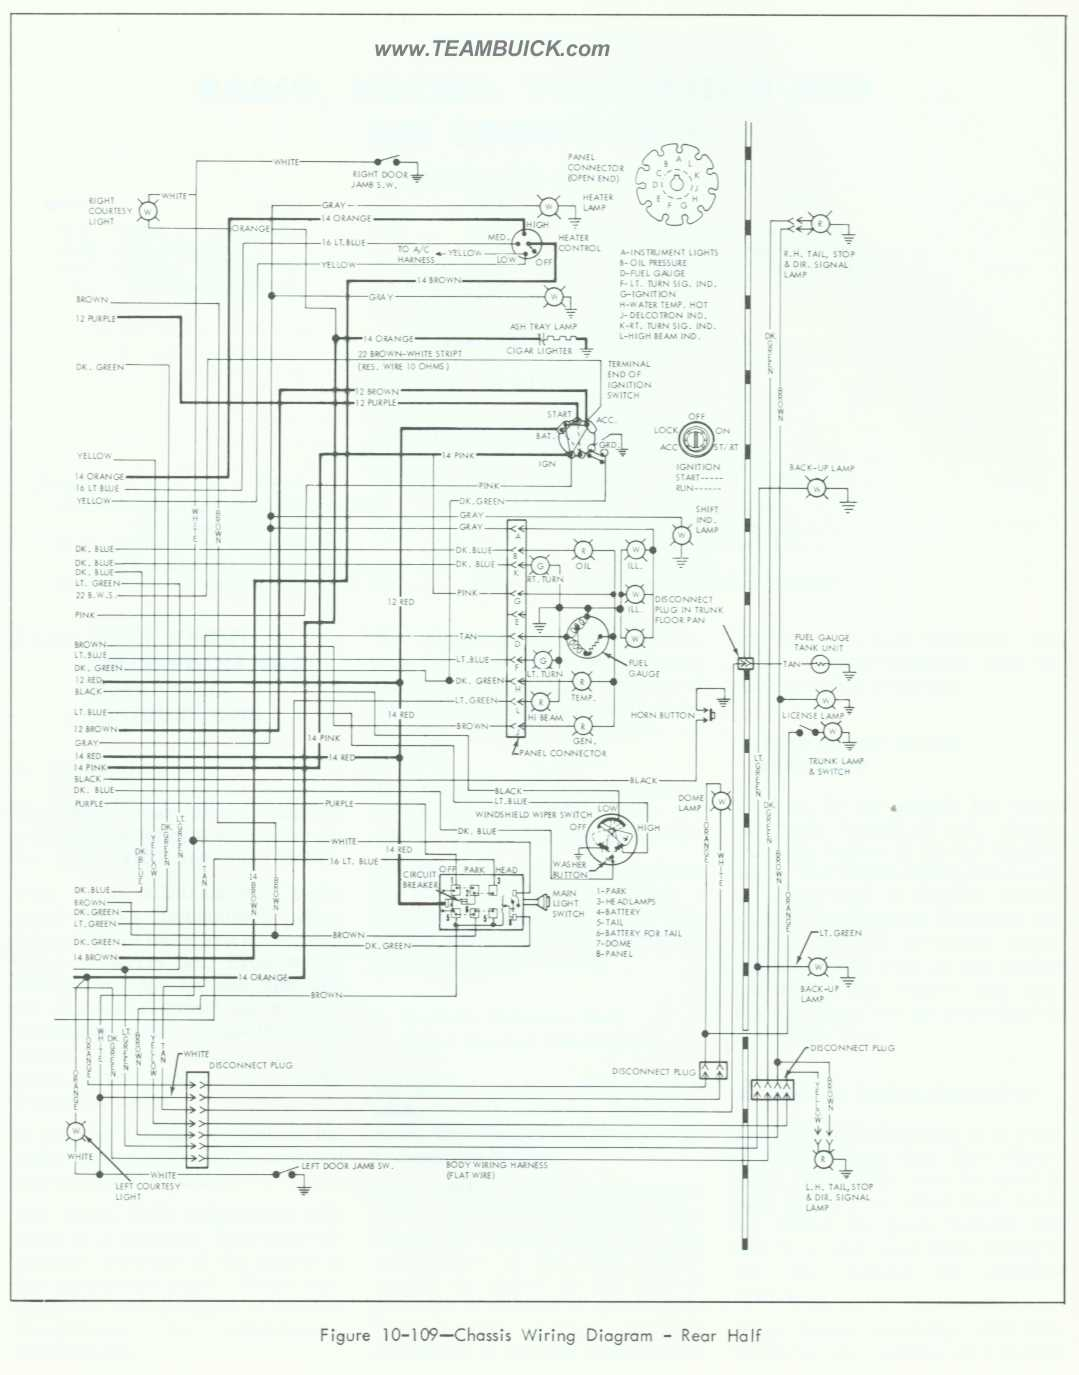 1964 Skylark Wiring Diagram Reinvent Your Dodge Dart Buick Special Rear Half Rh Teambuick Com 1965 1966